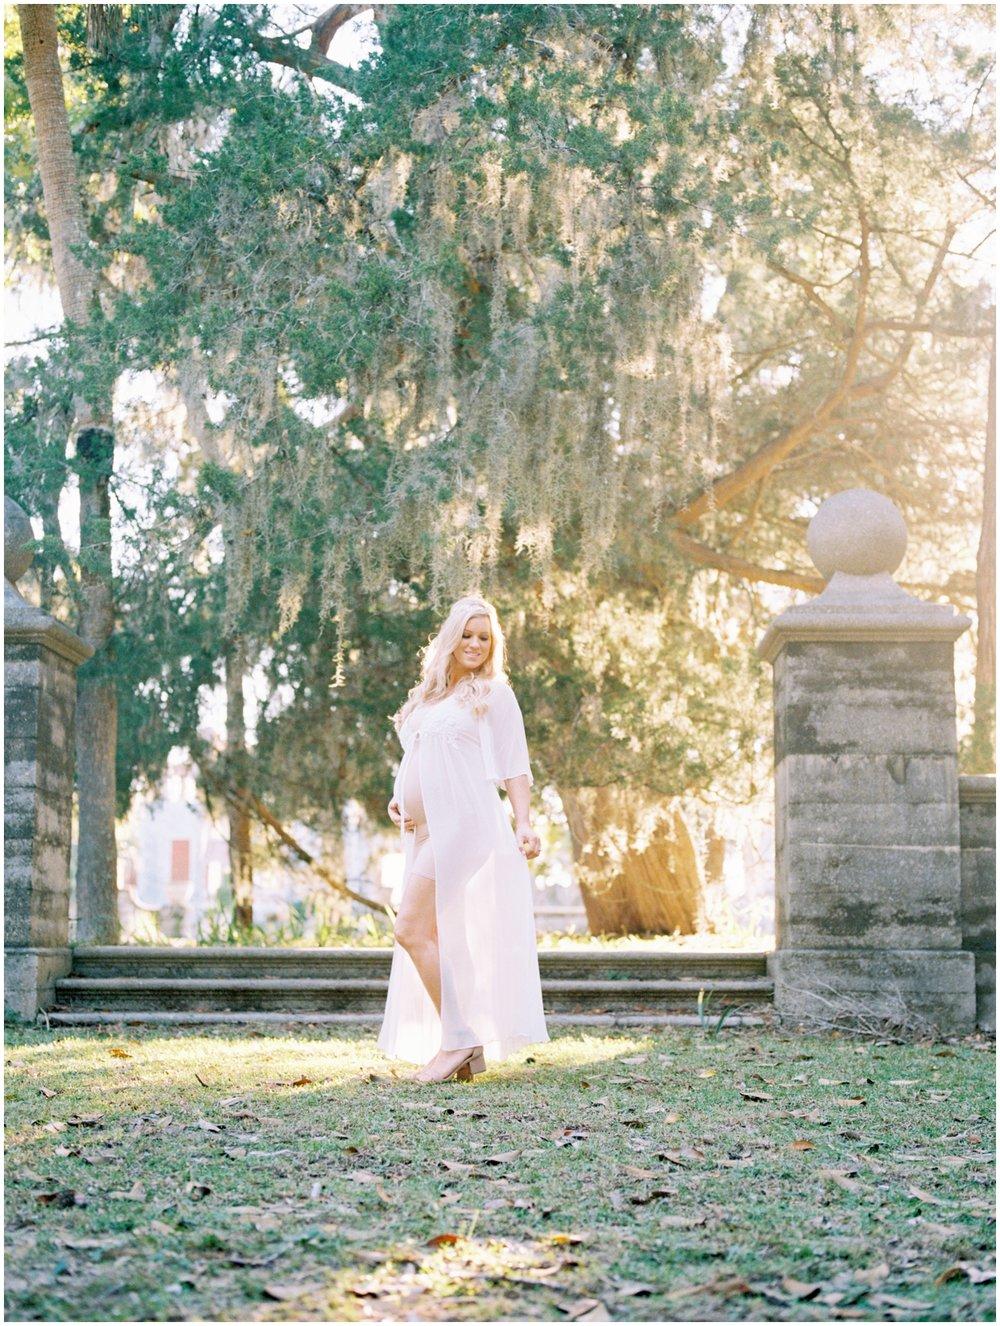 Lisa Silva Photography -Maternity Session at Cumberland Island, Georgia - Jacksonville and North East Florida Fine Art Film Photographer_0012.jpg